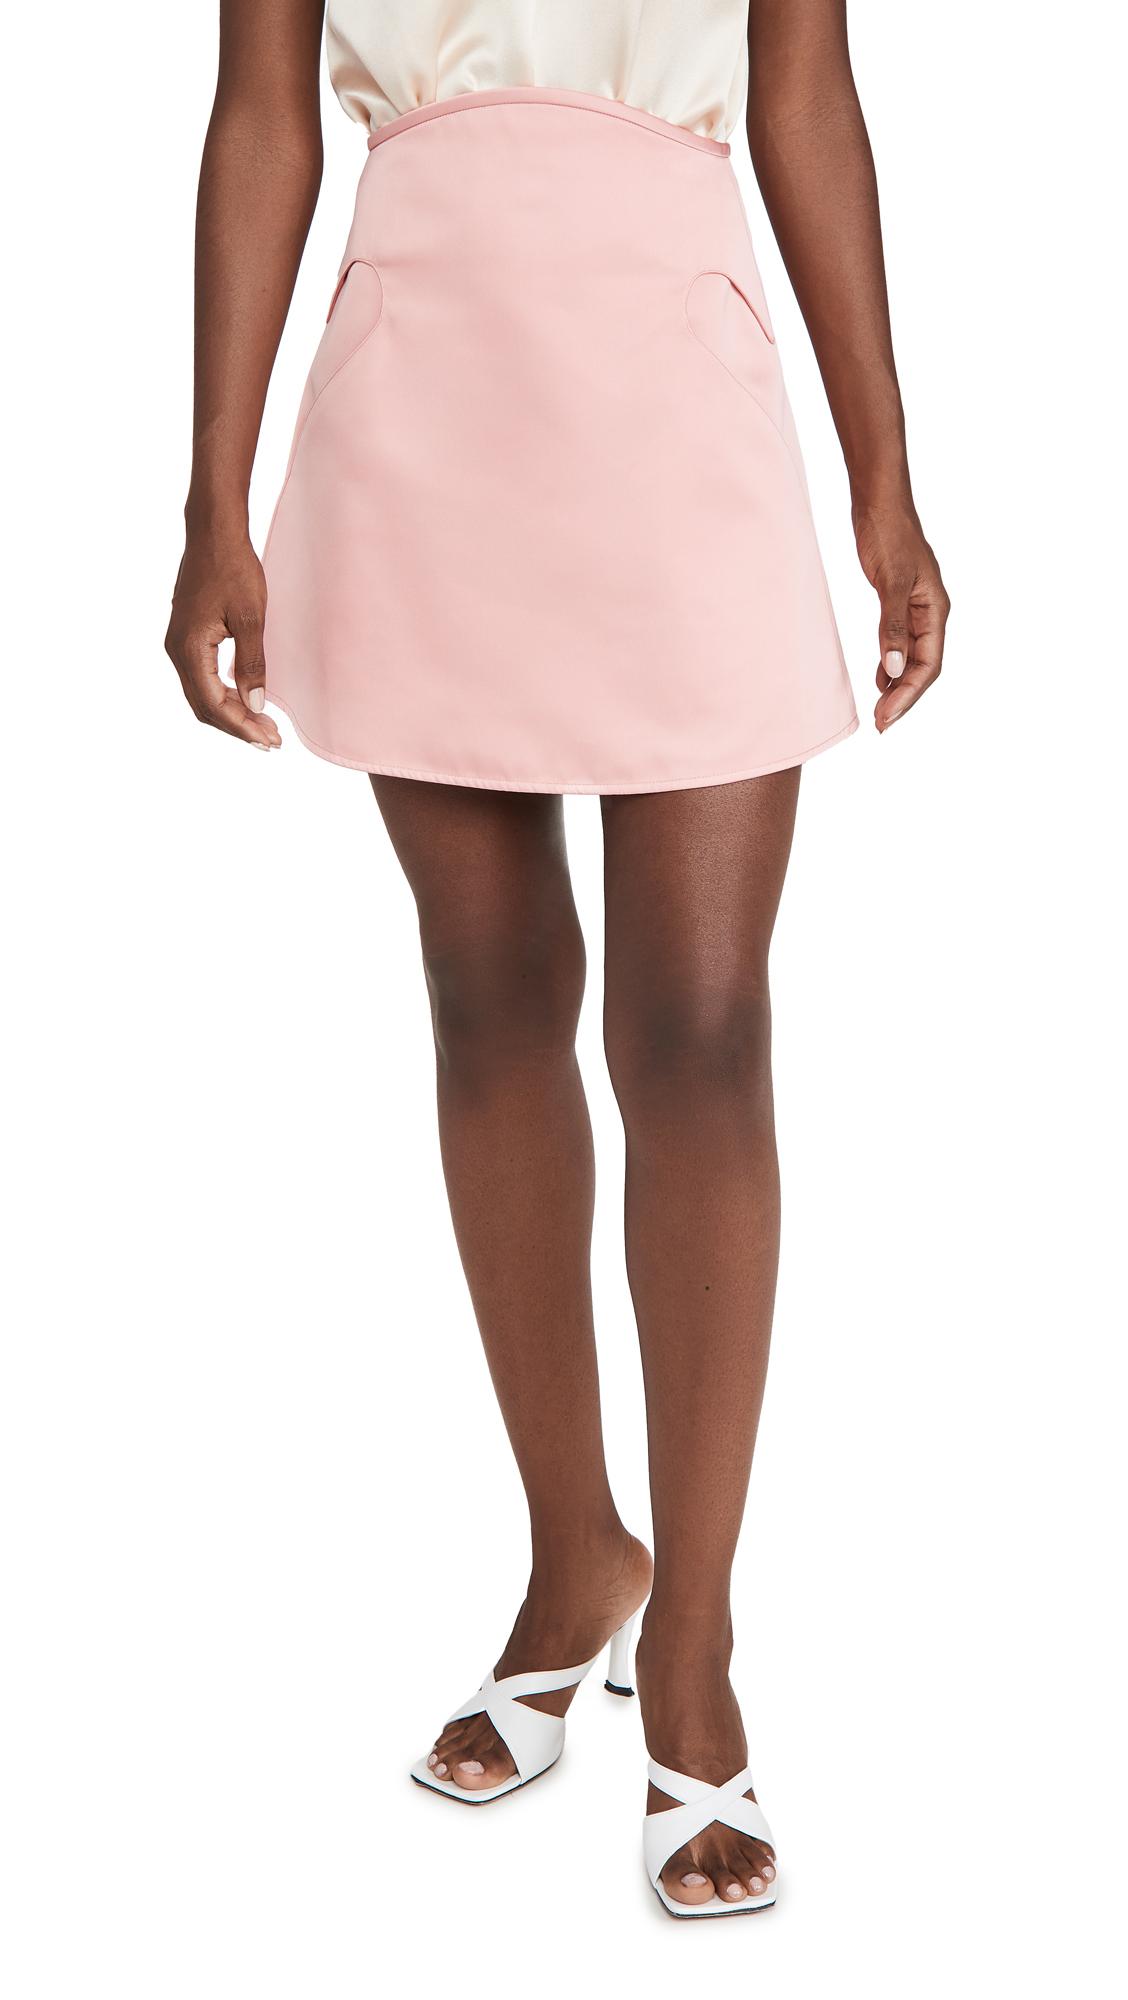 Ellery Biros Skirt